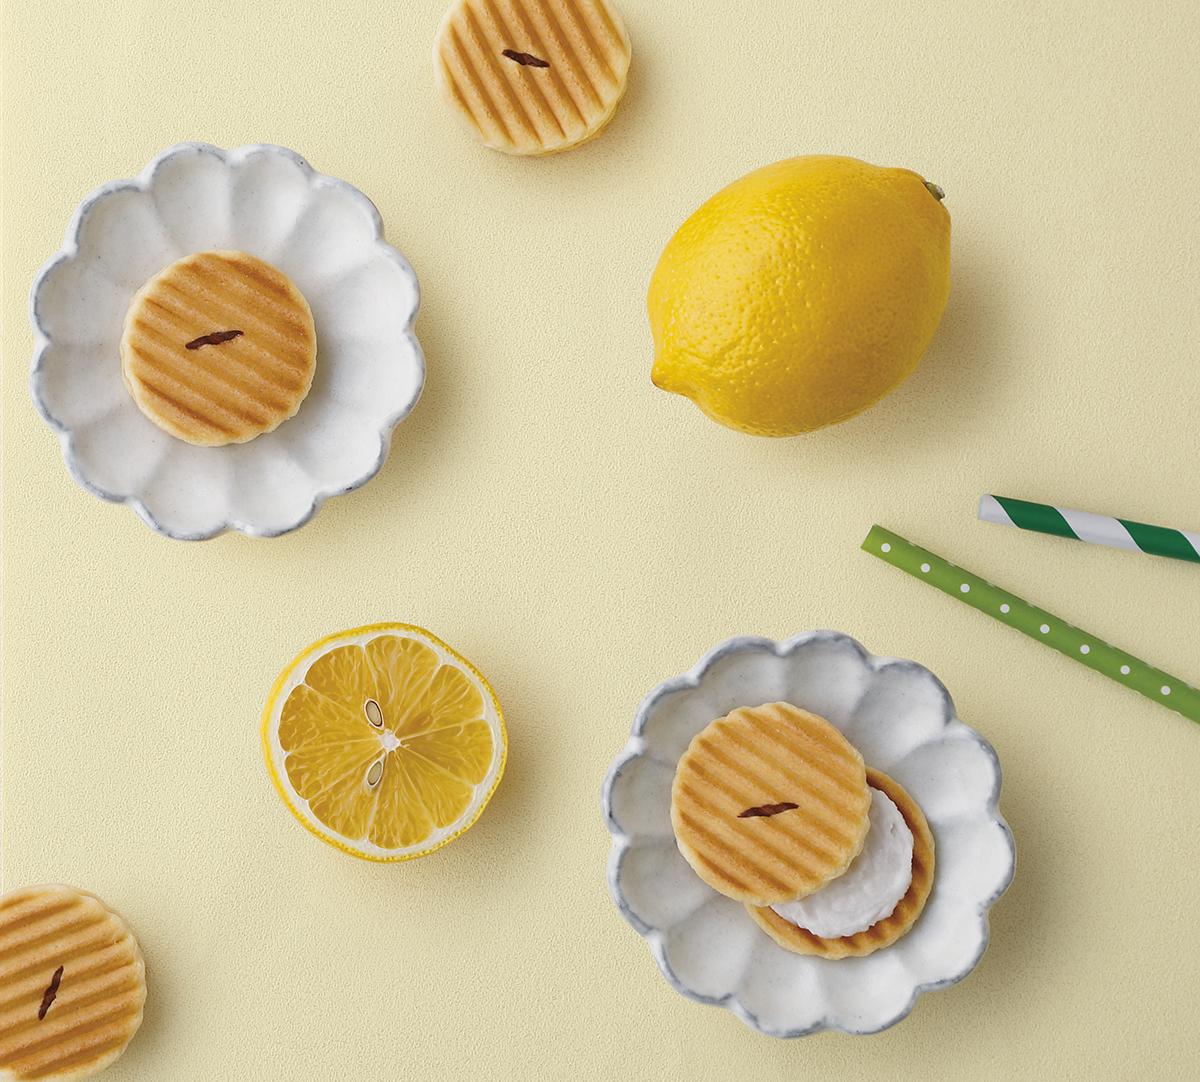 test ツイッターメディア - 【株式会社鼓月】涼しげでポップな初夏に贈りたい新商品「姫千寿せんべいレモンスカッシュ」4月8日販売開始。 https://t.co/LNI0HunbkH https://t.co/Or7bKW2oUA